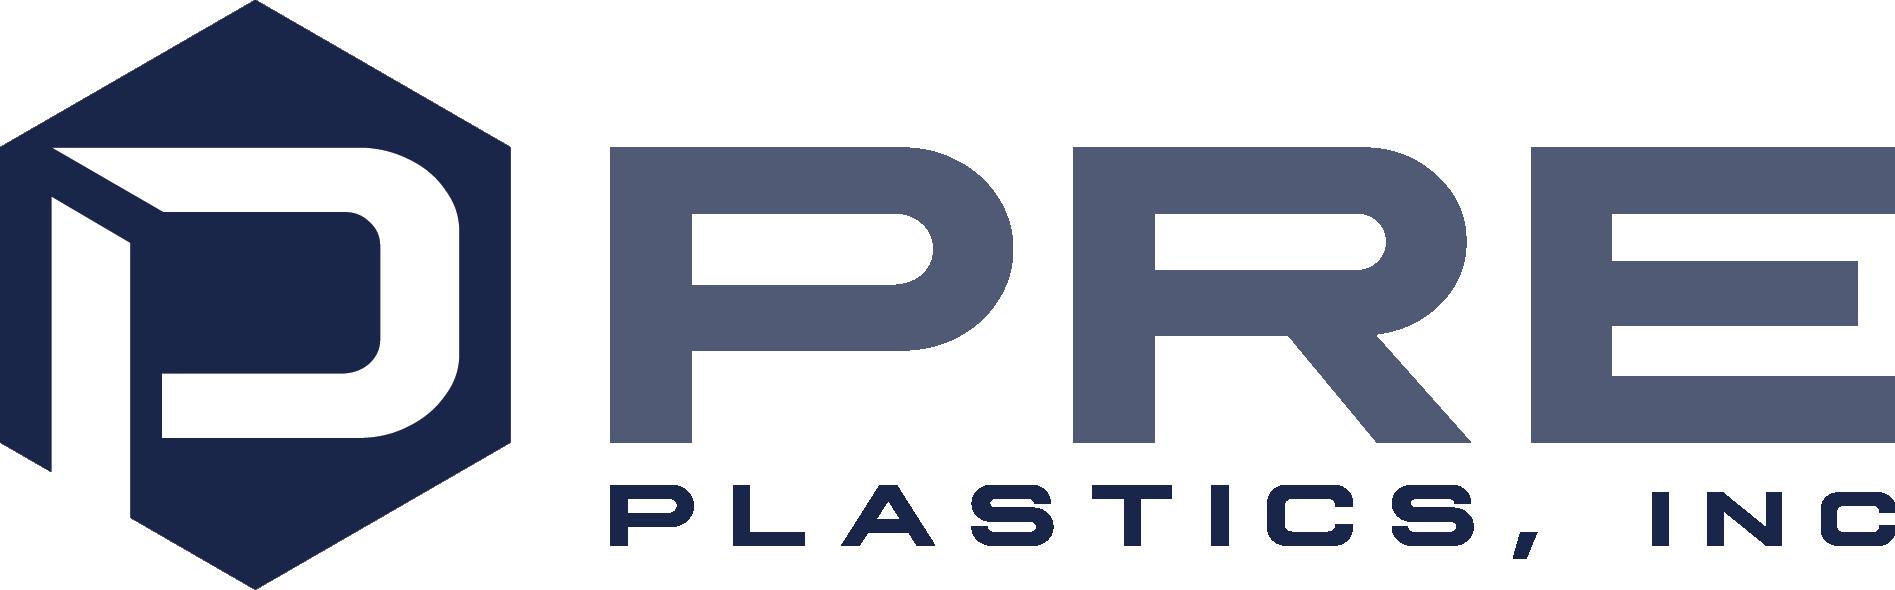 Made-in-California-manufacturer-pre-plastics-Logo.png